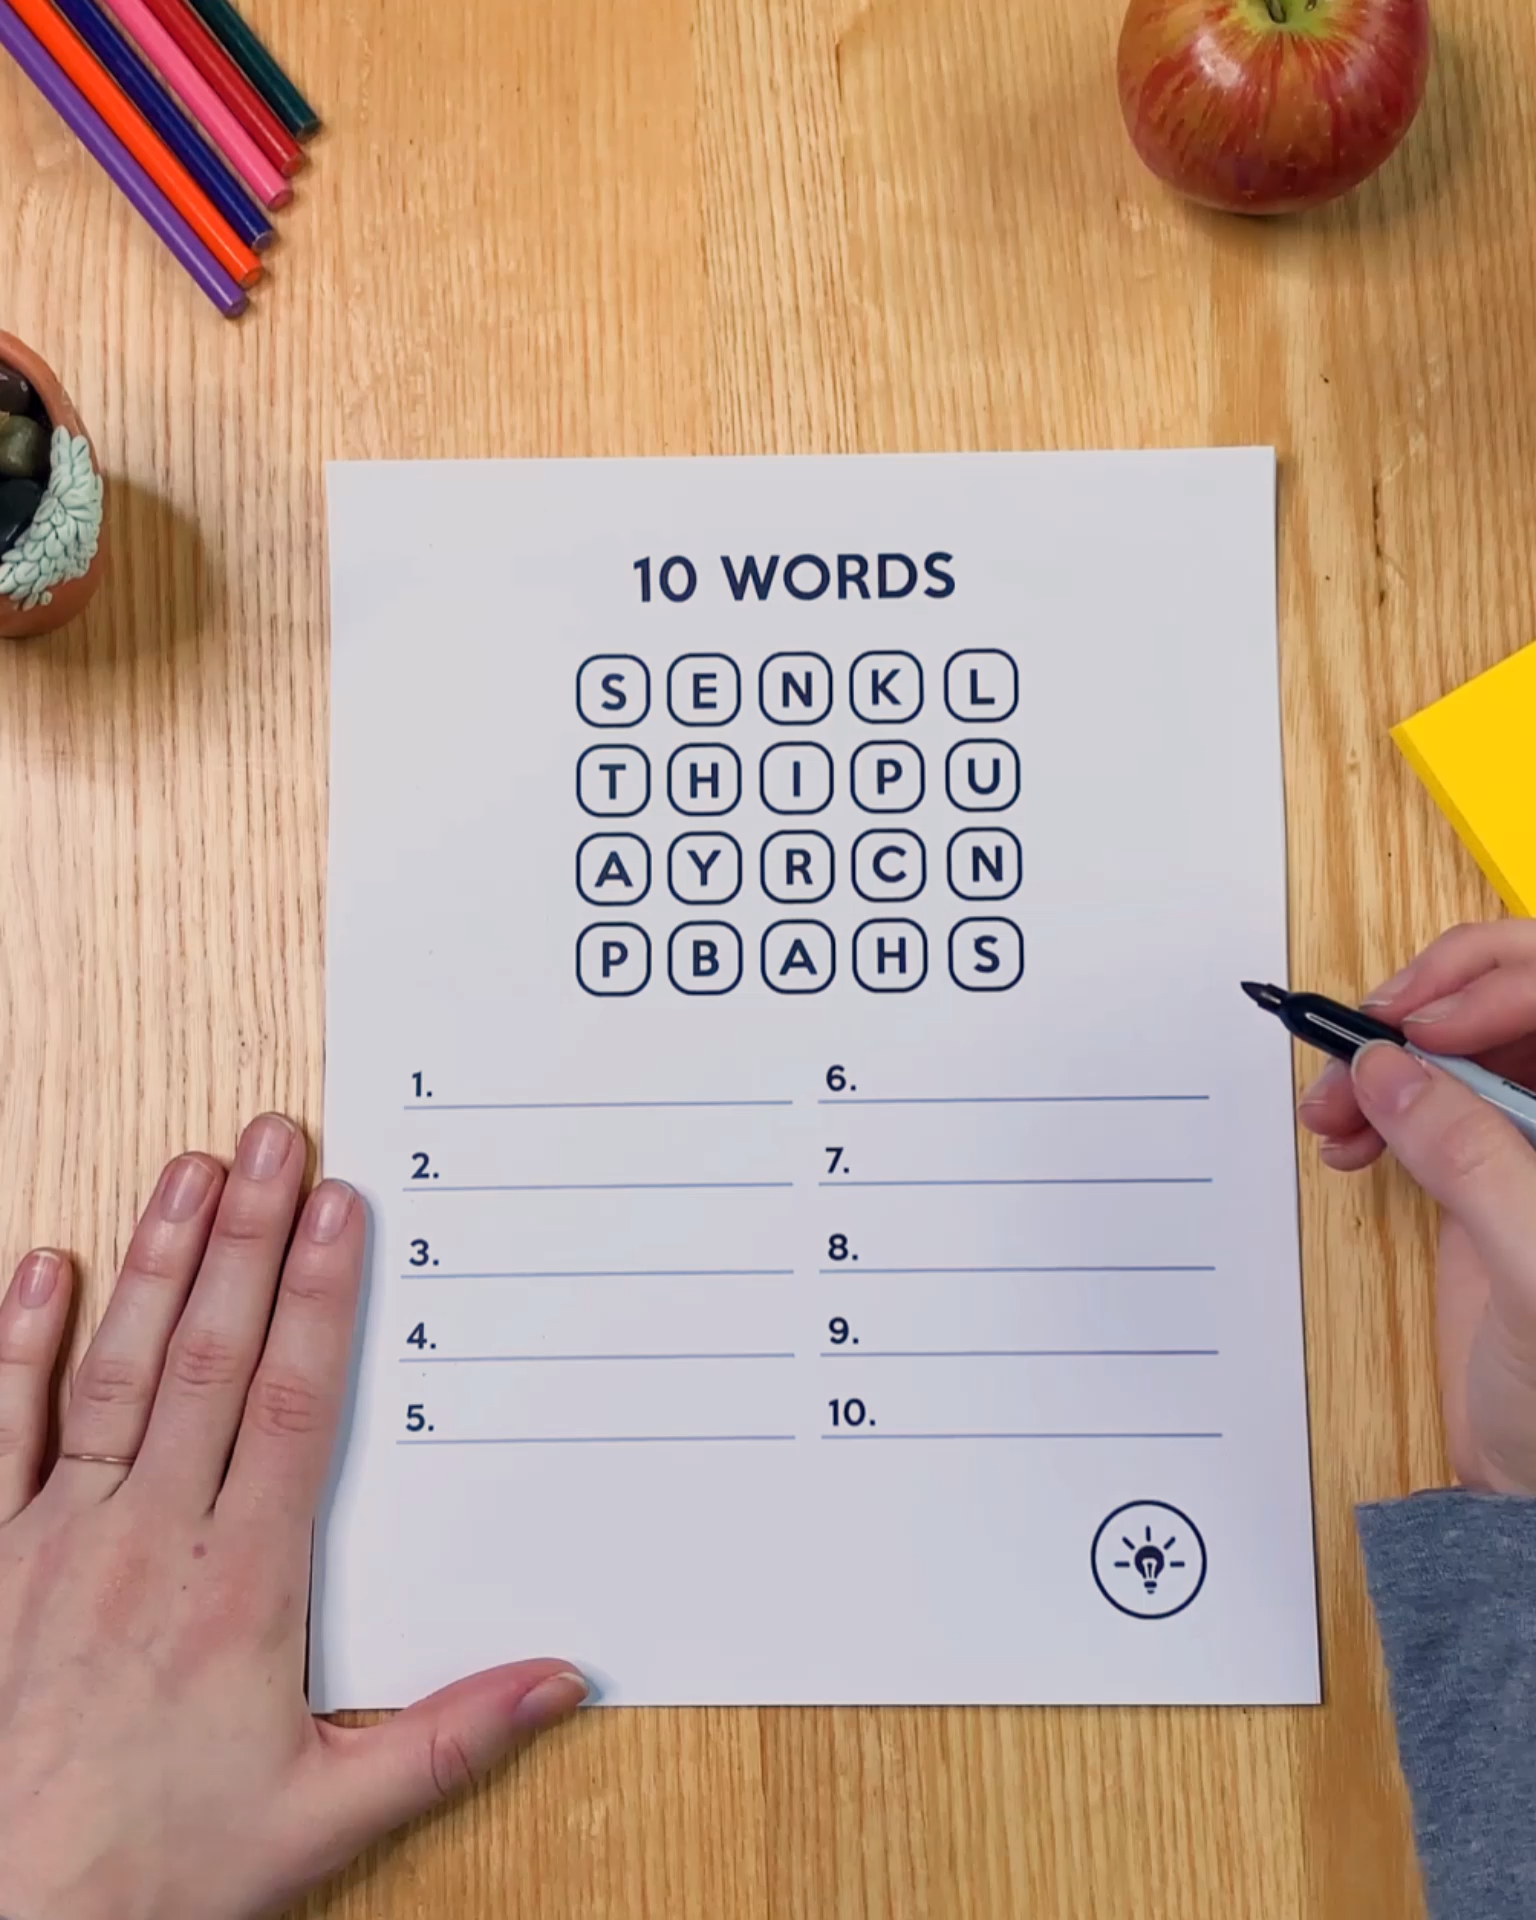 10 Words Can You Find Them All Video Teaching Skills Teaching Kids Teaching